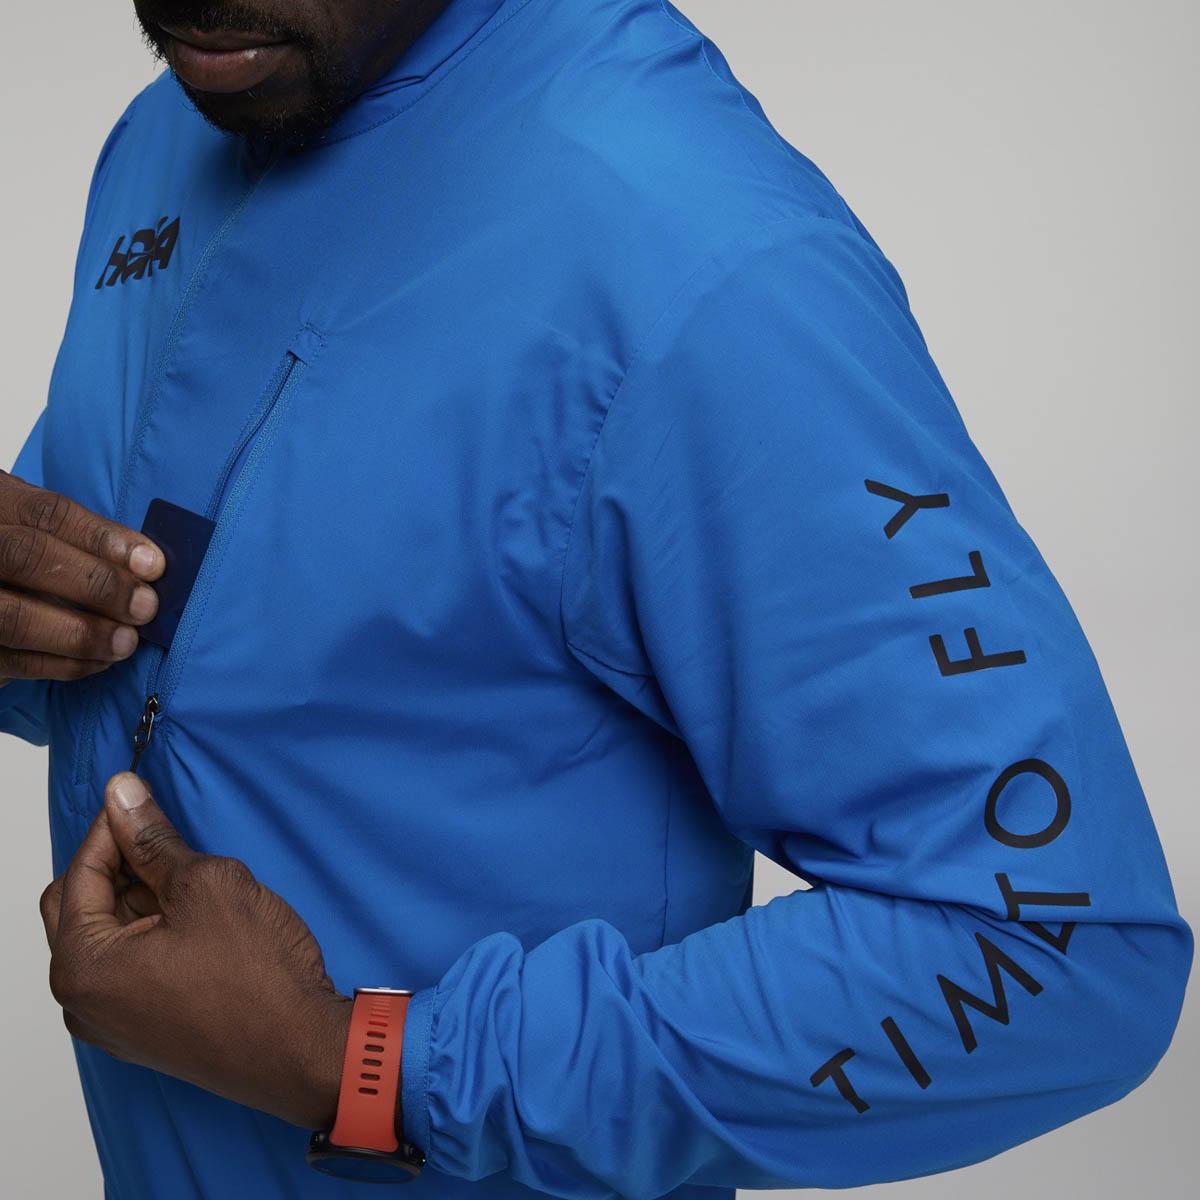 Hoka One One se lance dans le textile performance (et lifestyle)